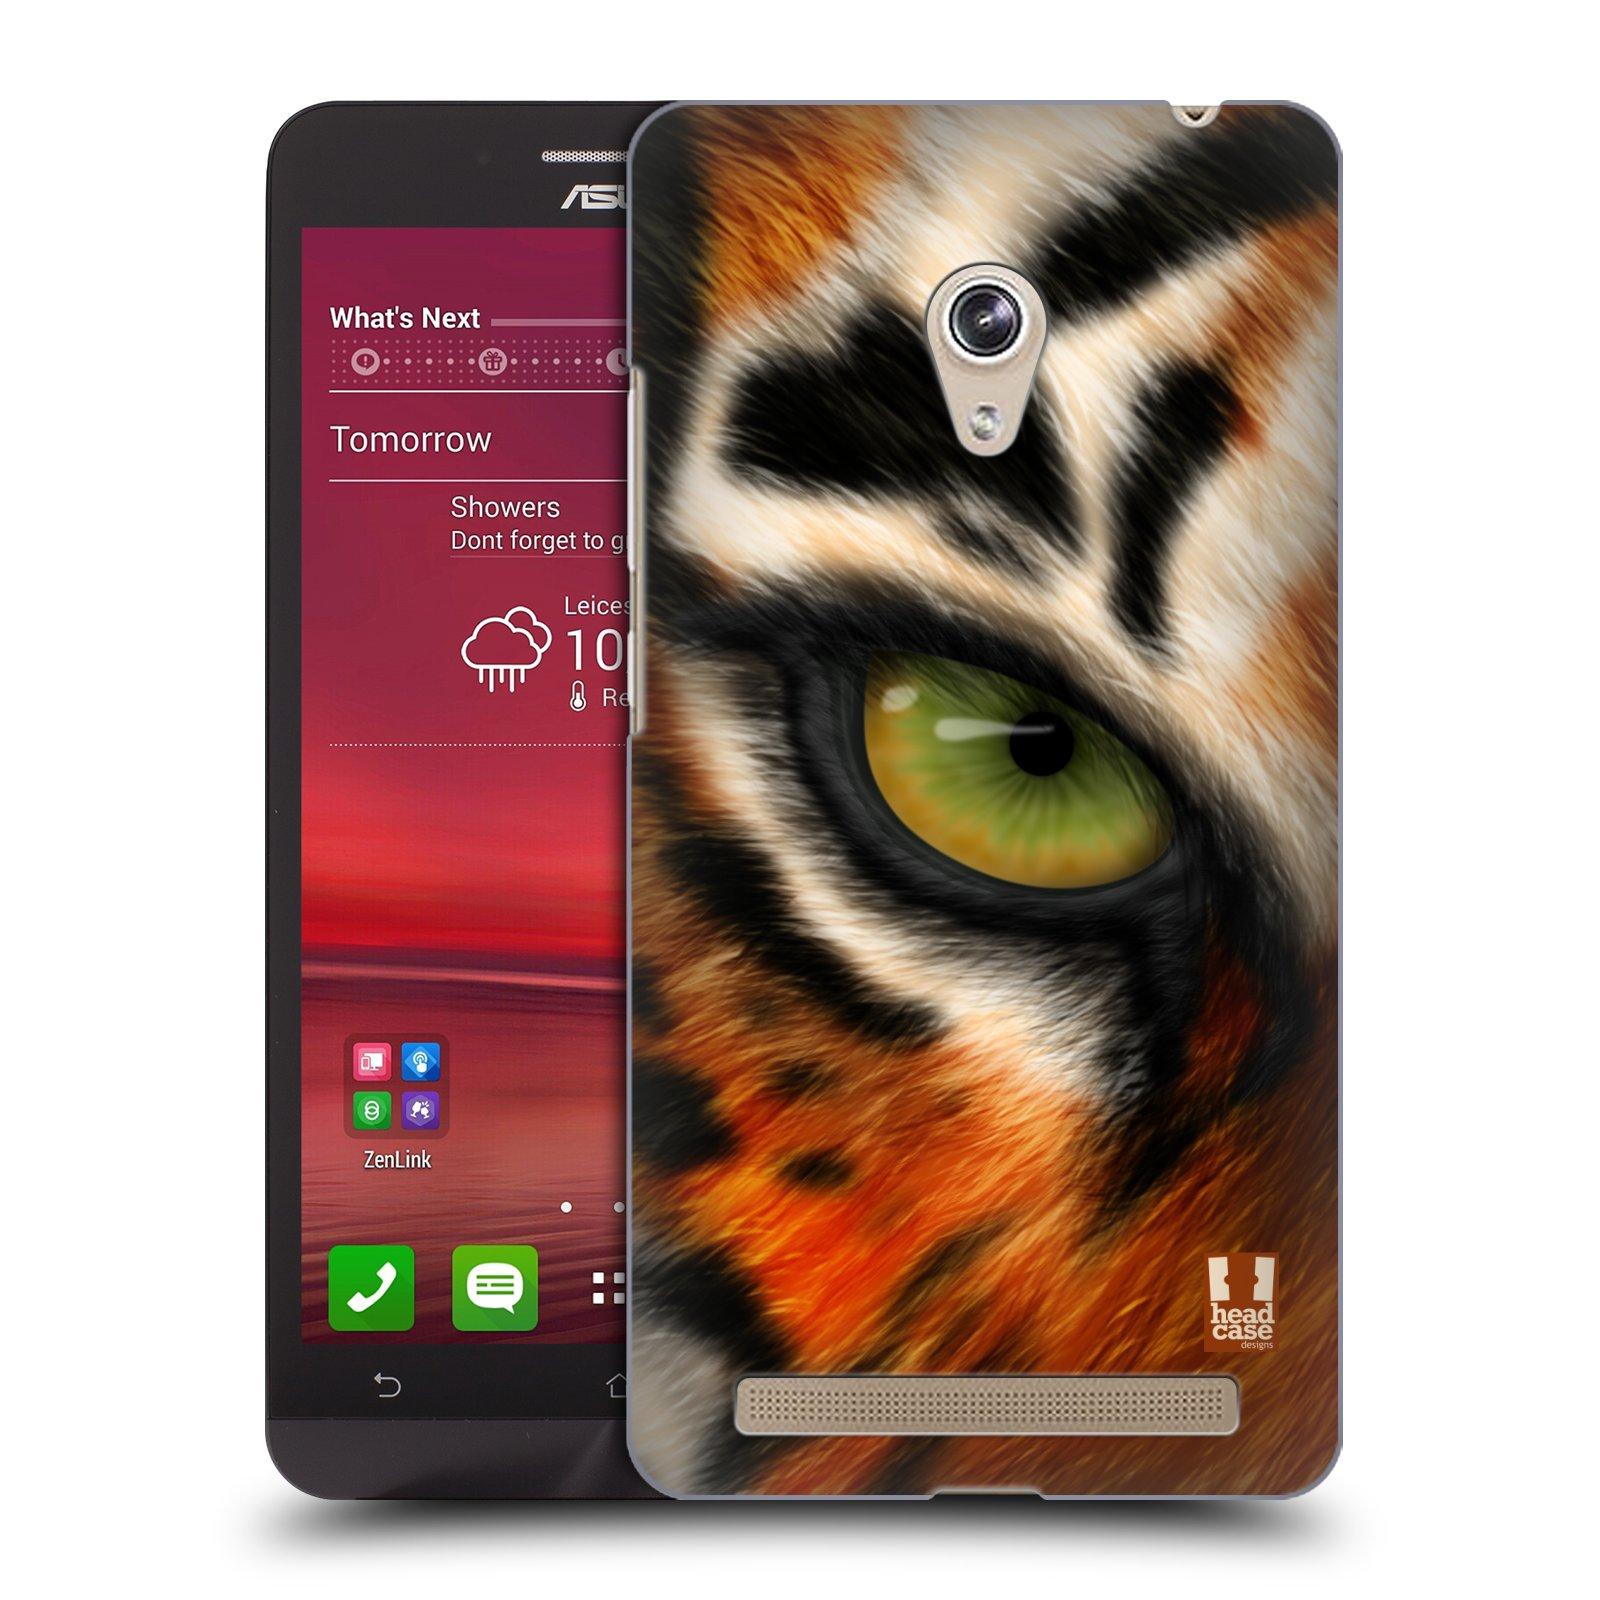 HEAD CASE plastový obal na mobil Asus Zenfone 6 vzor pohled zvířete oko tygr